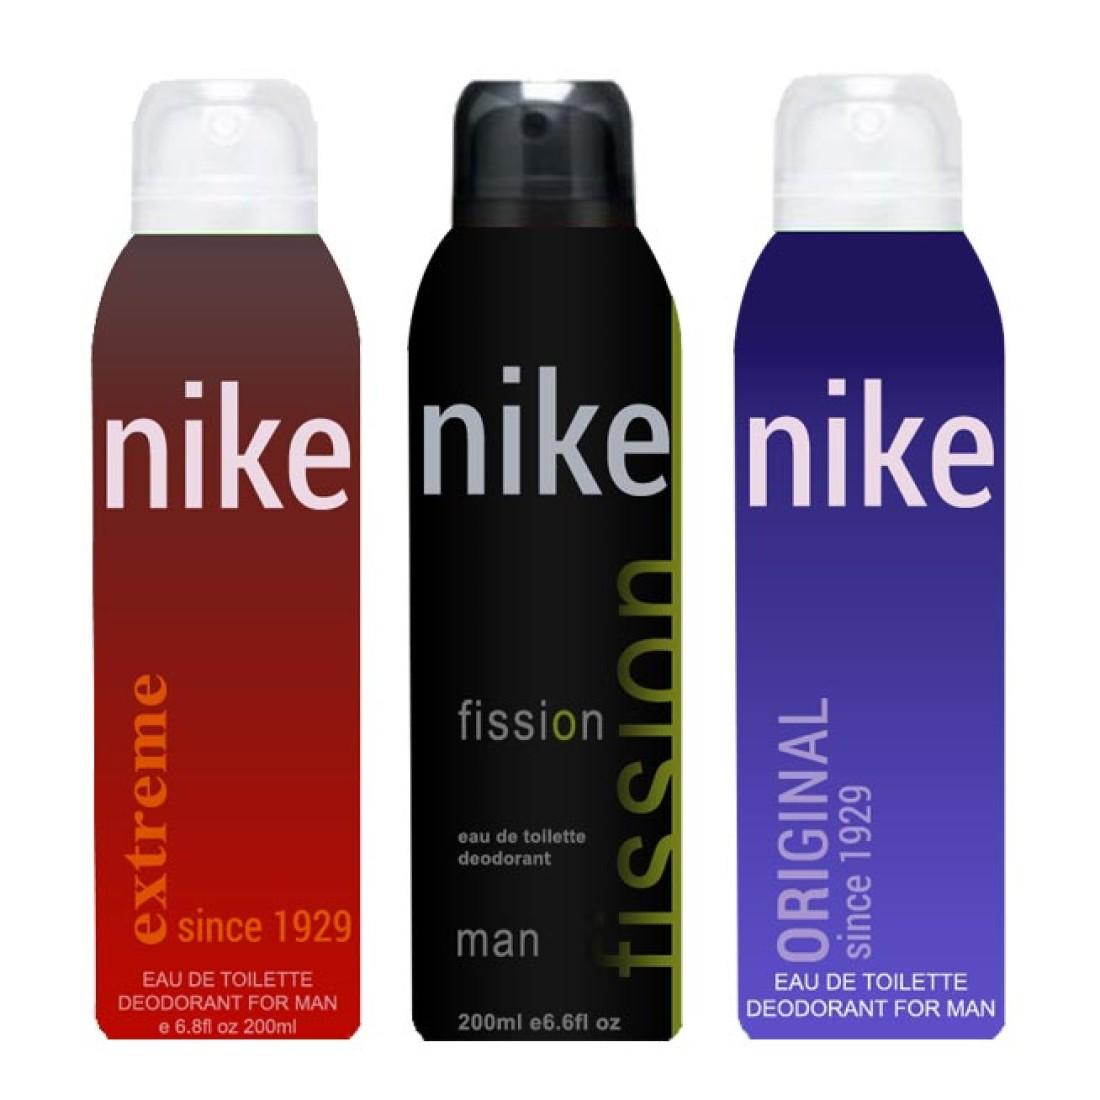 Nike Extreme Fission Original Body Spray  -  For Men